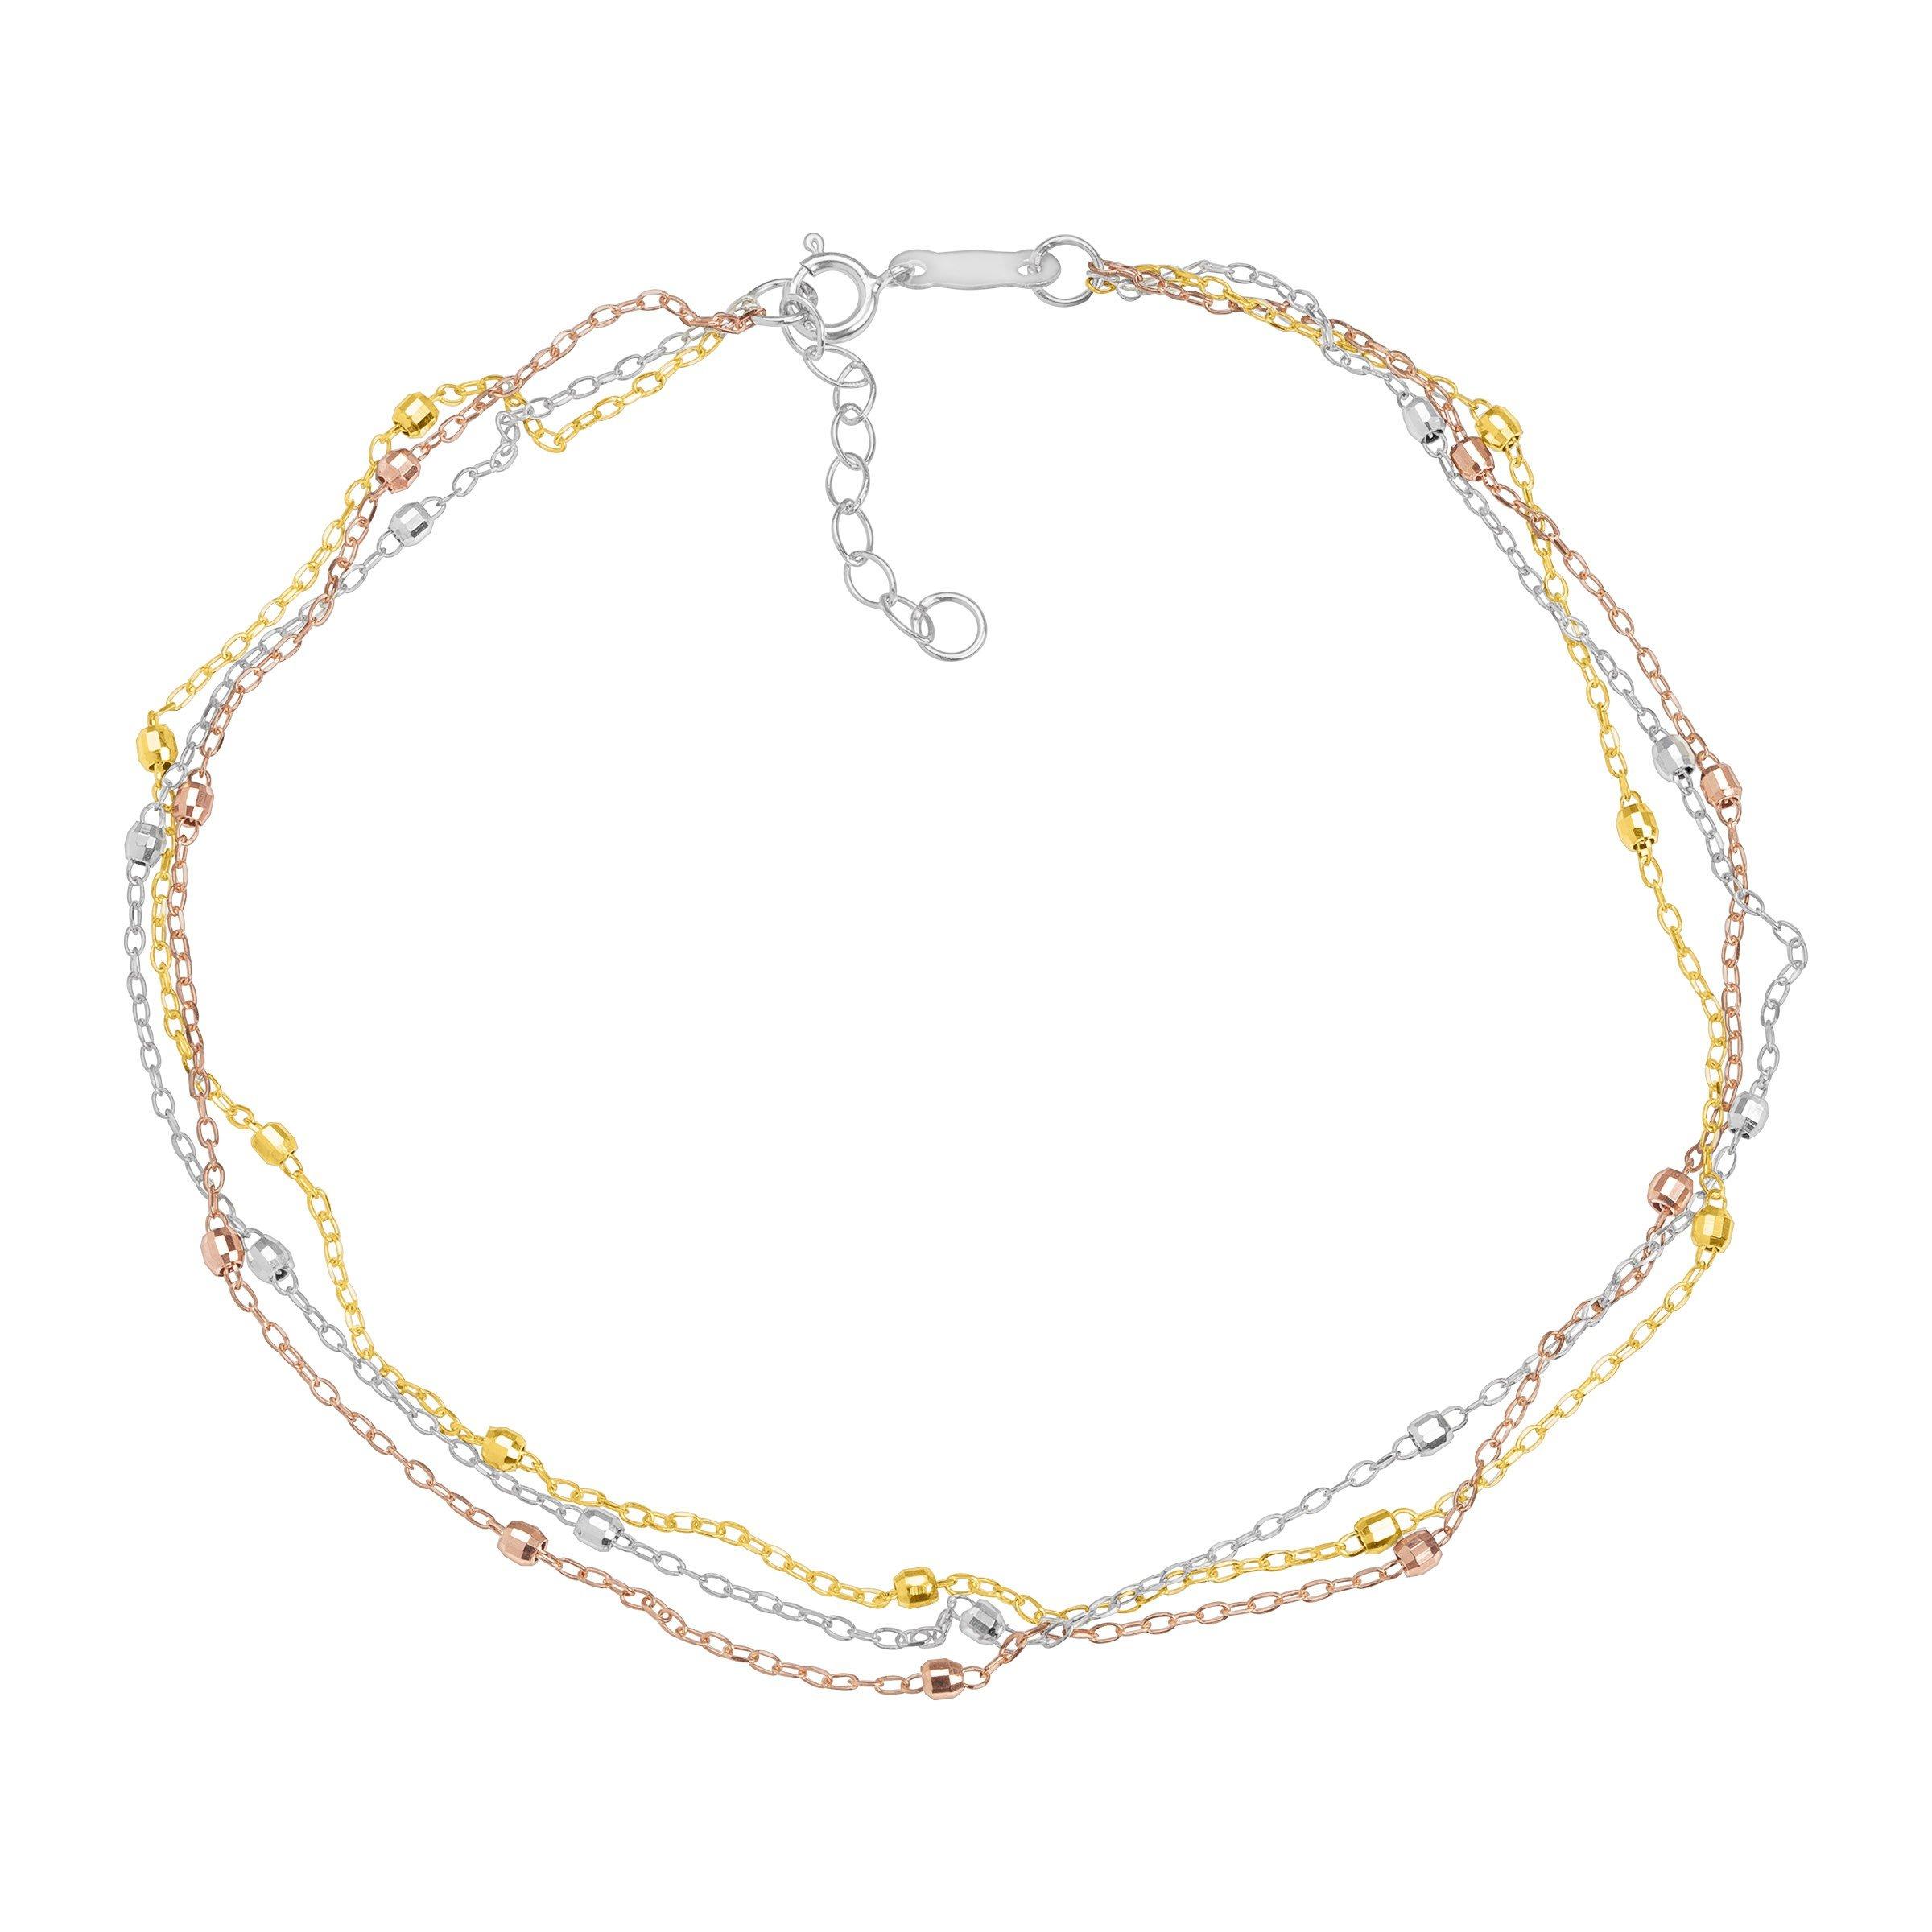 Just Gold Triple-Strand Beaded Anklet Bracelet in 14K Three Tone Gold